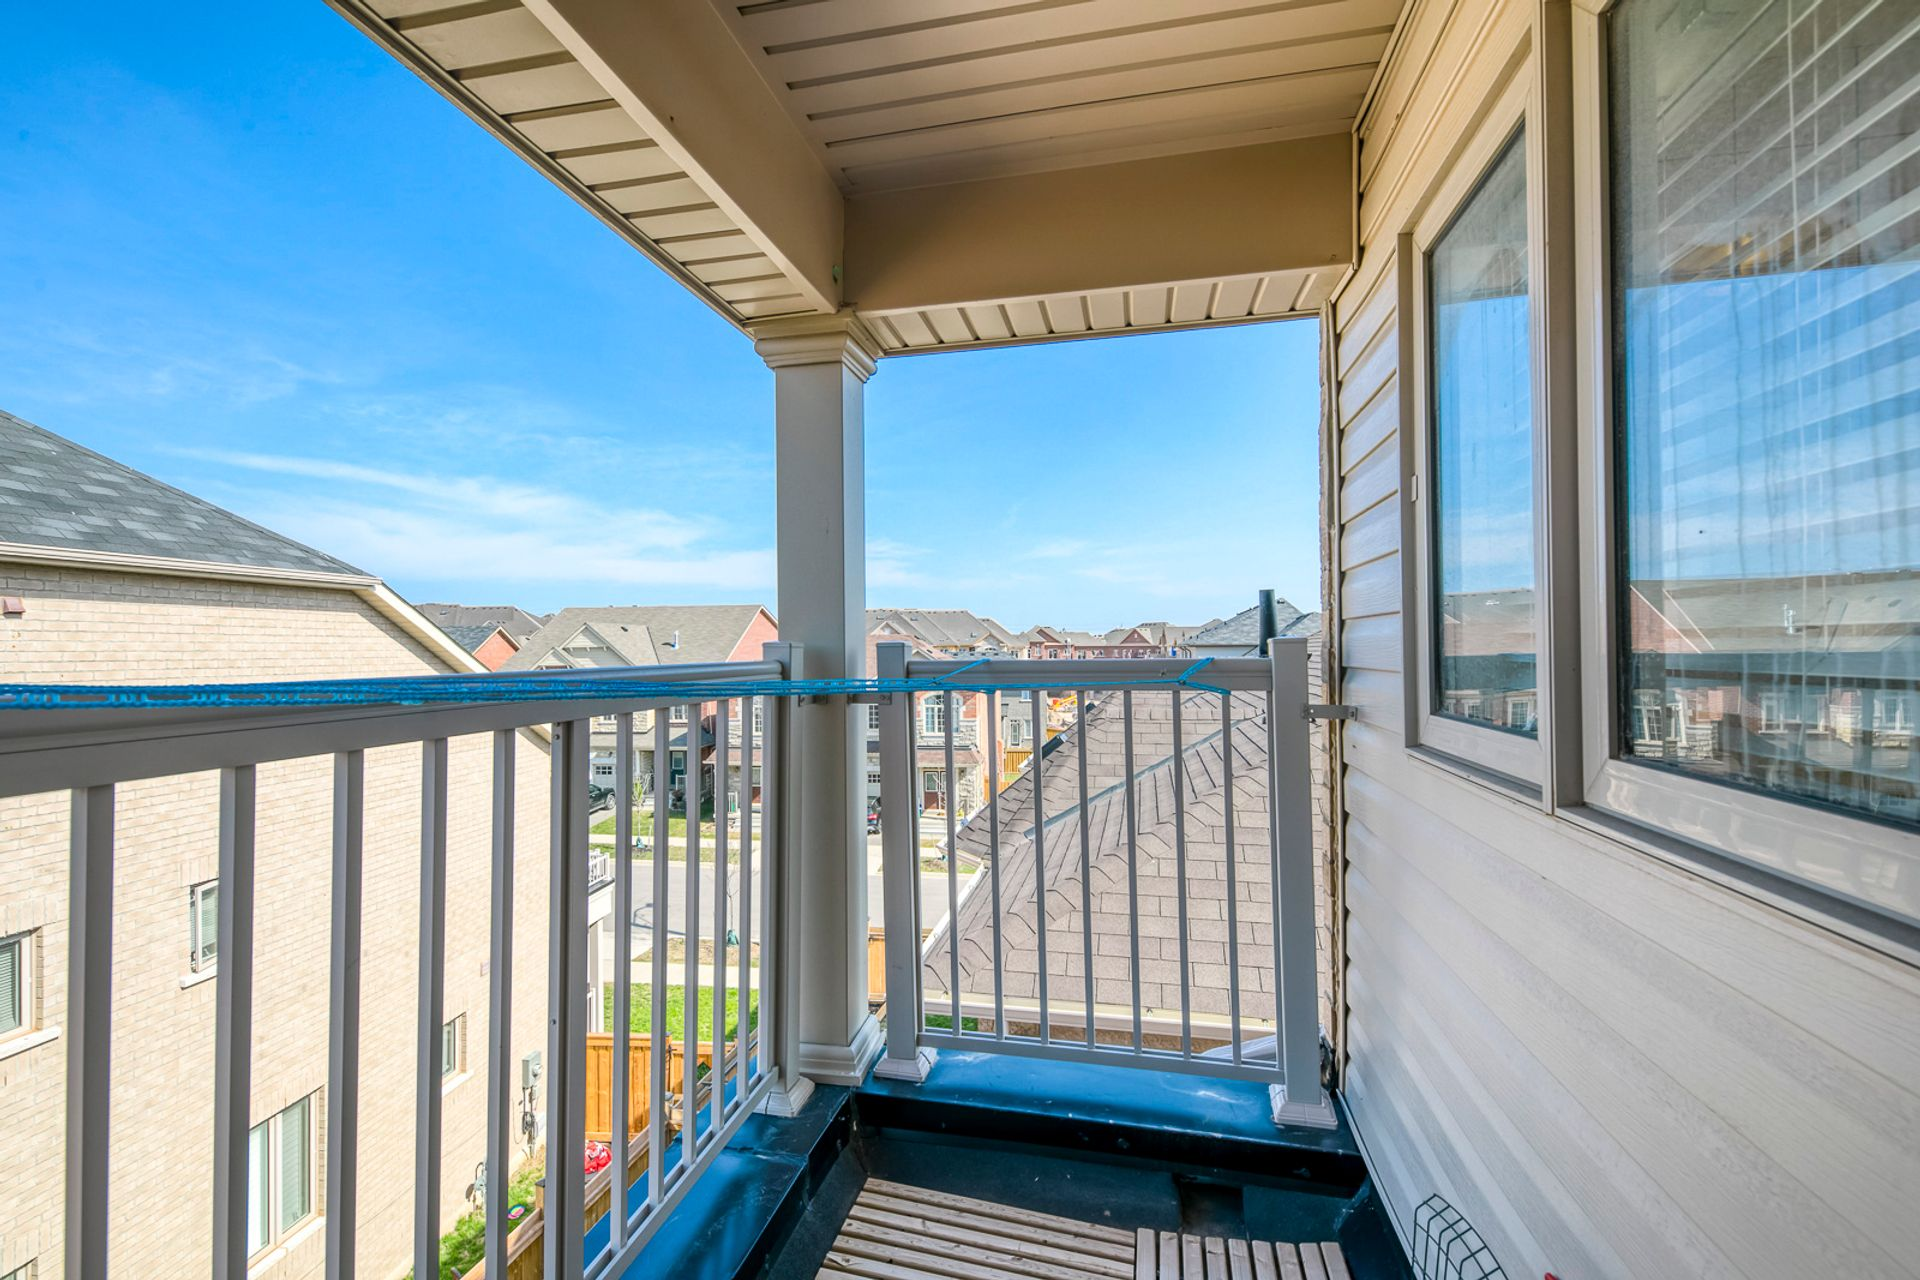 Balcony - 3045 Max Khan Blve, Oakville - Elite3 & Team at 3045 Max Khan Boulevard, Rural Oakville, Oakville